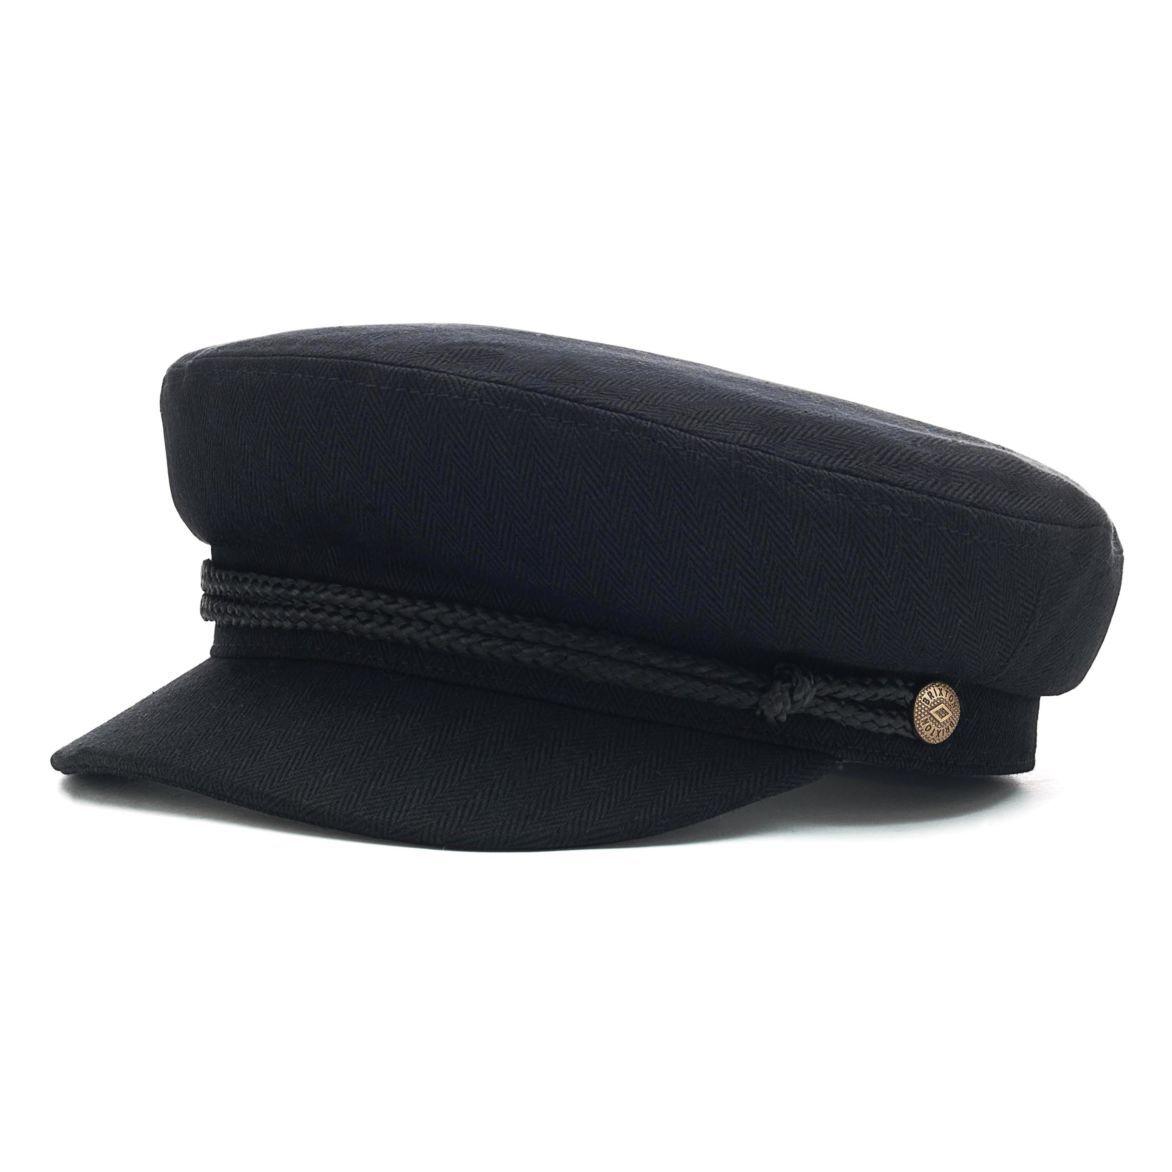 ecc756634f248 FIDDLER CAP - Caps - Headwear - Women s